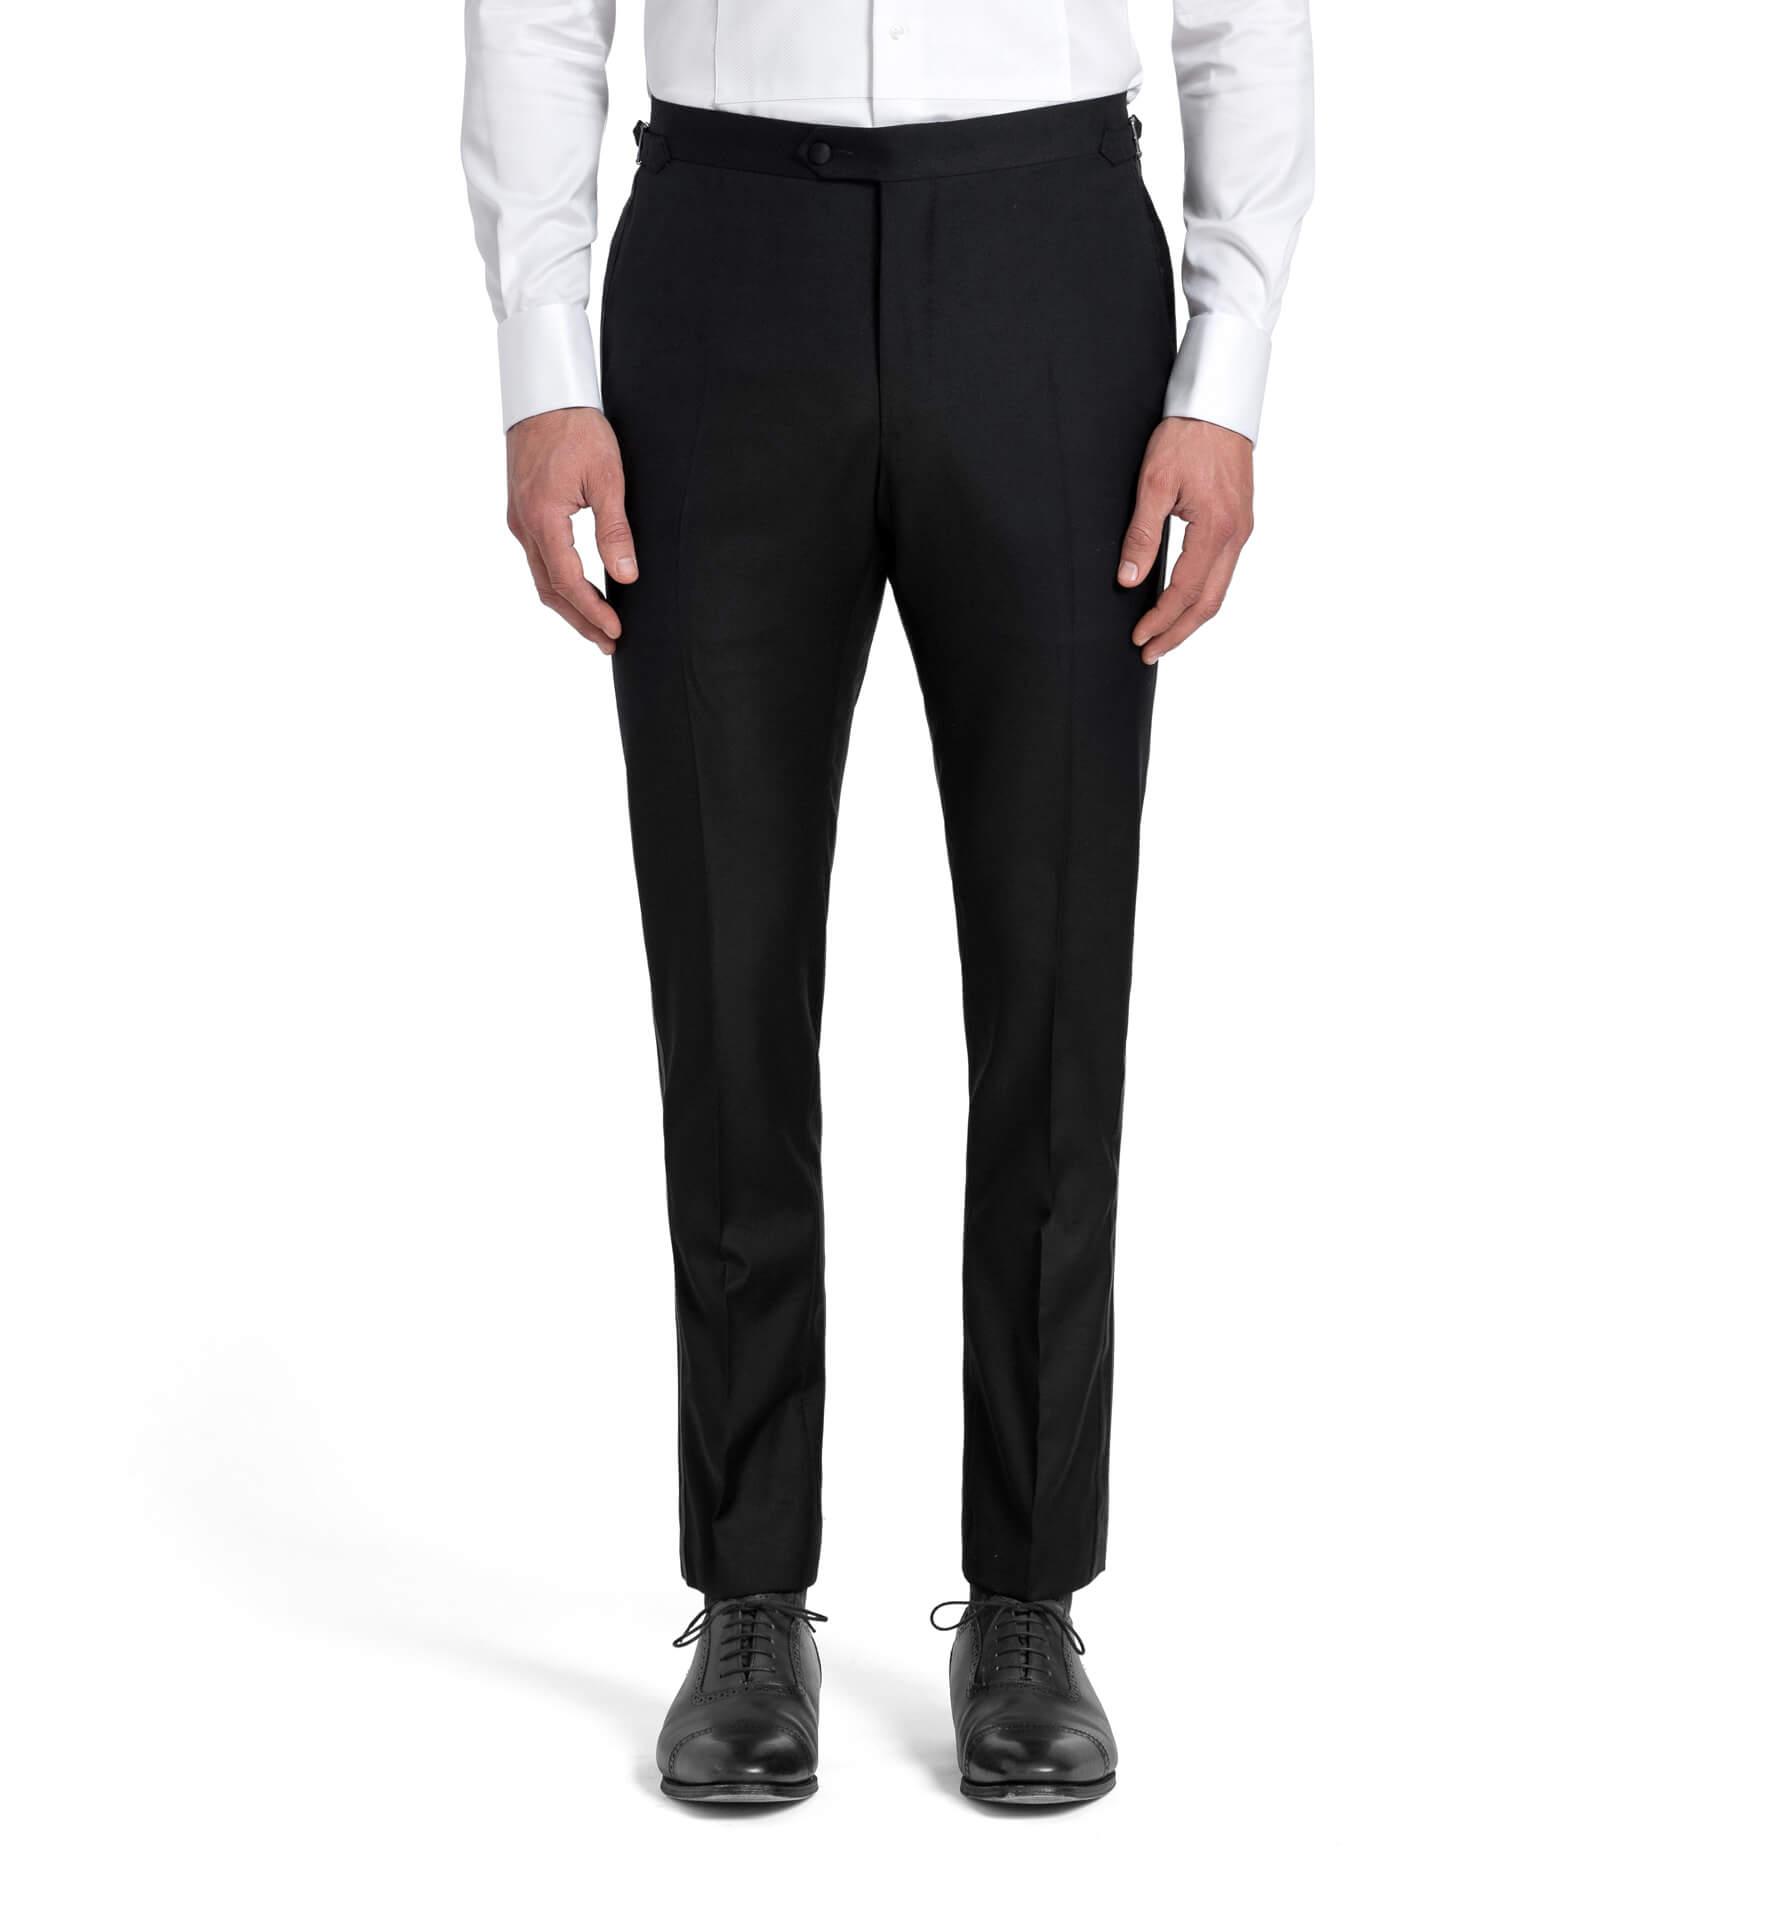 Zoom Image of Mayfair Black Wool and Linen Tuxedo Trouser